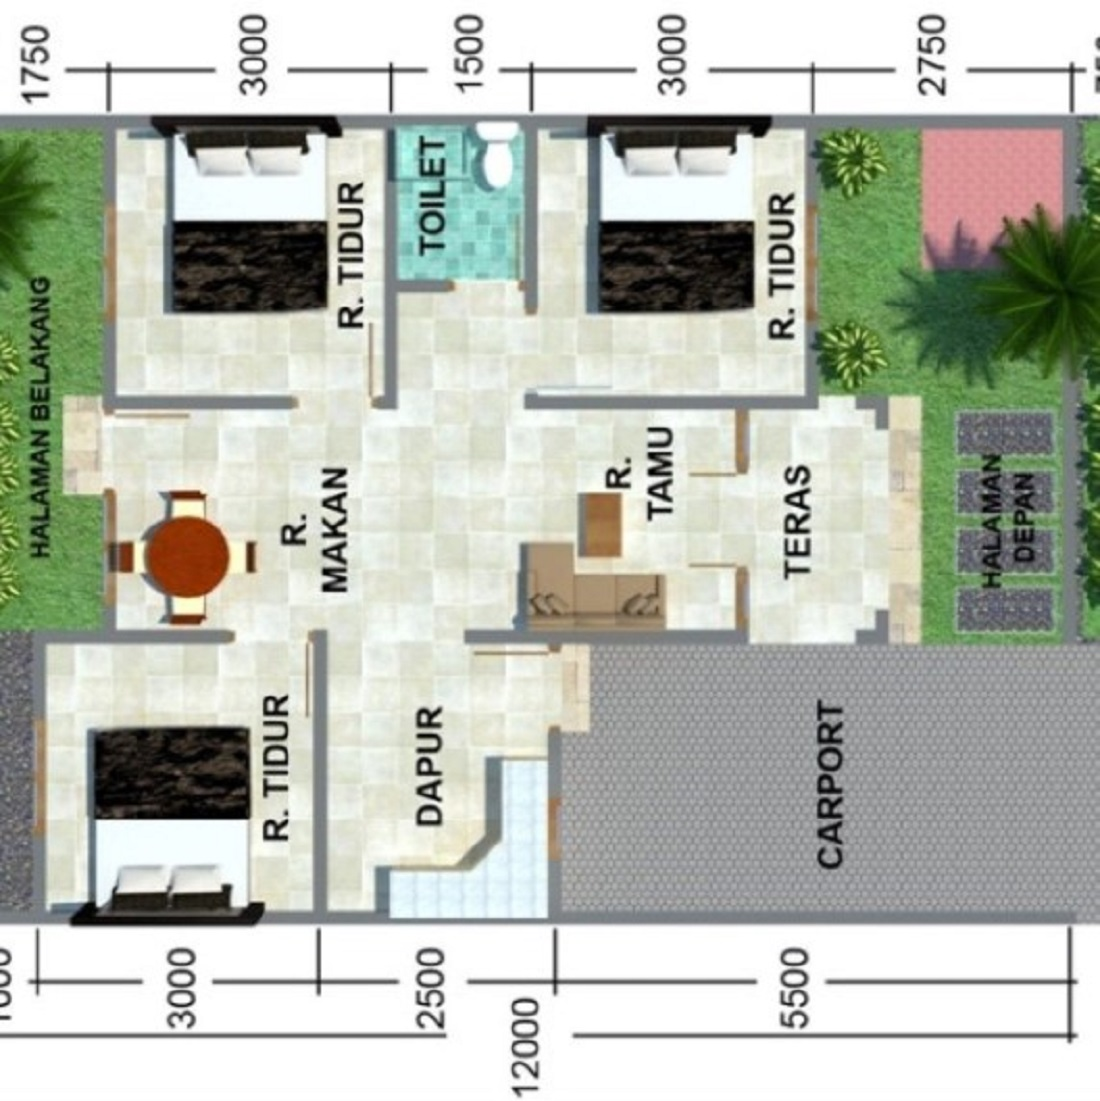 Gambar Rumah Minimalis 3 Kamar Tidur 1 Lantai